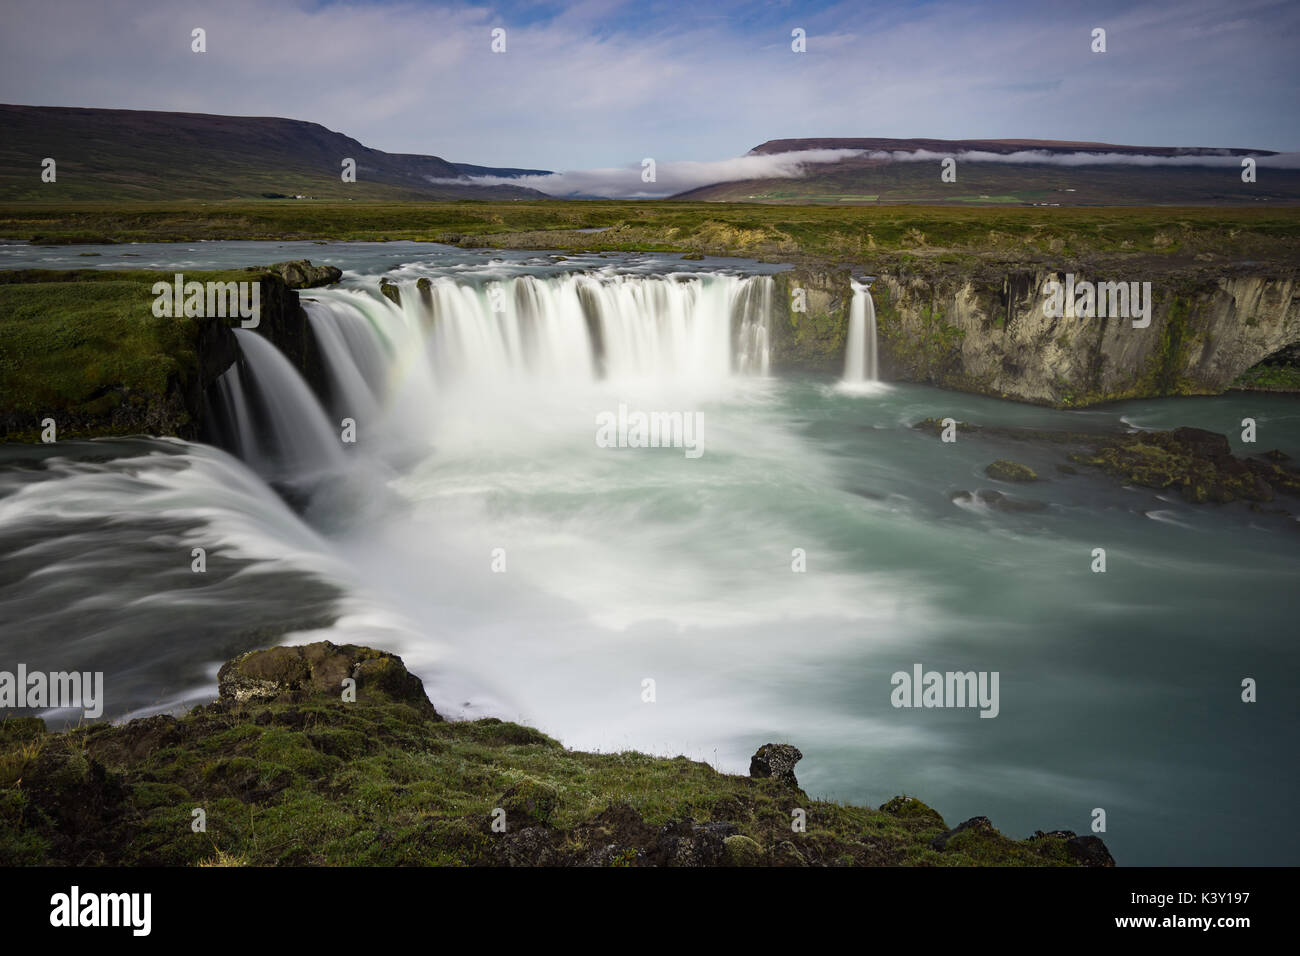 Long exposure of Godafoss, Iceland - Stock Image